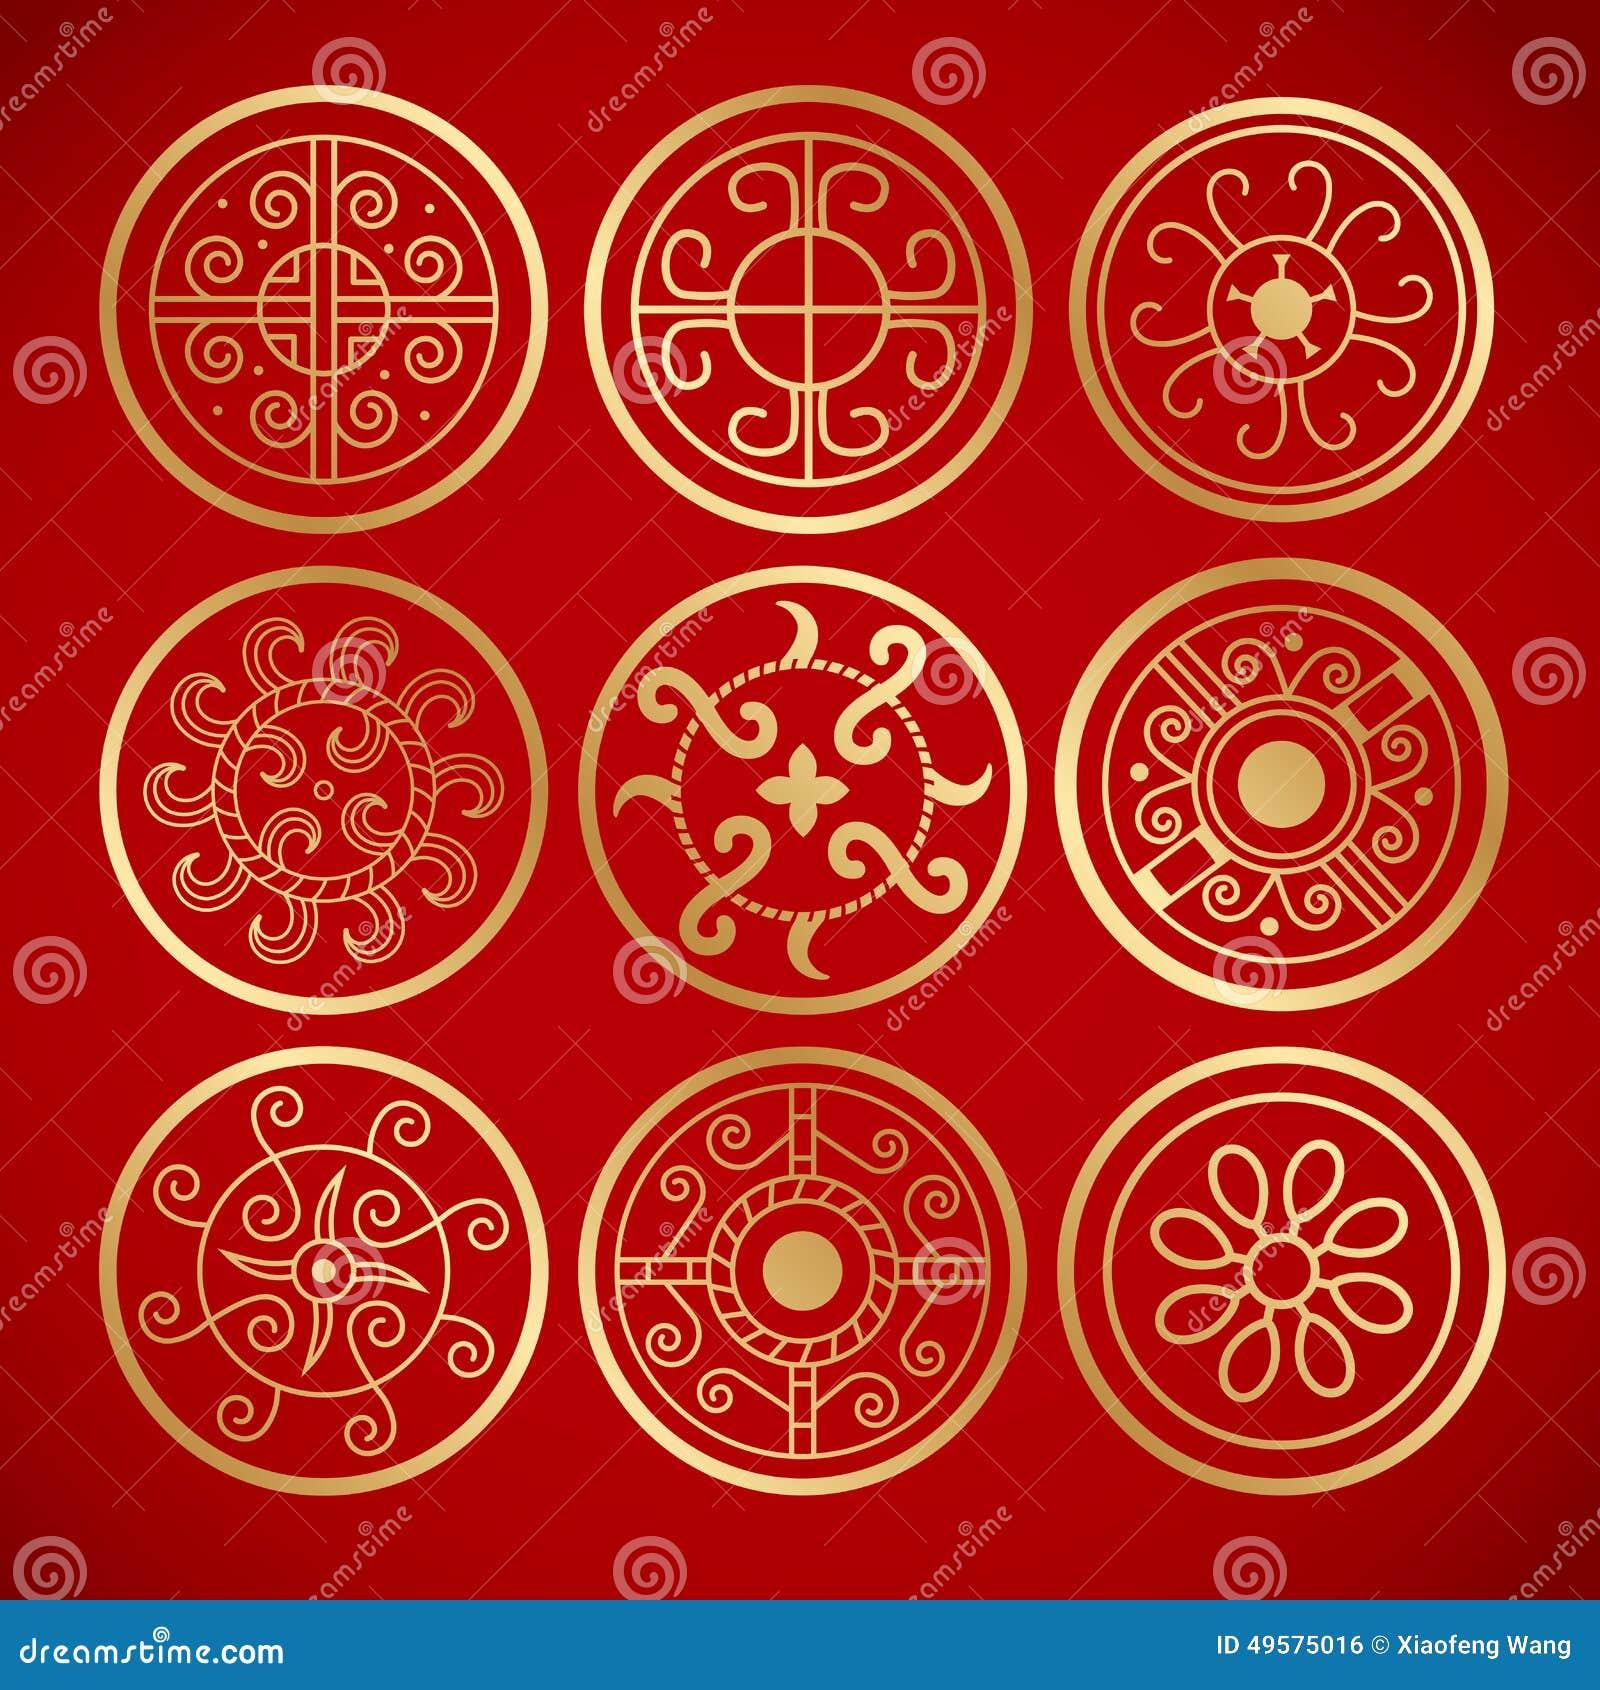 Nine Chinese Vintage Round Symbols Stock Vector Illustration Of